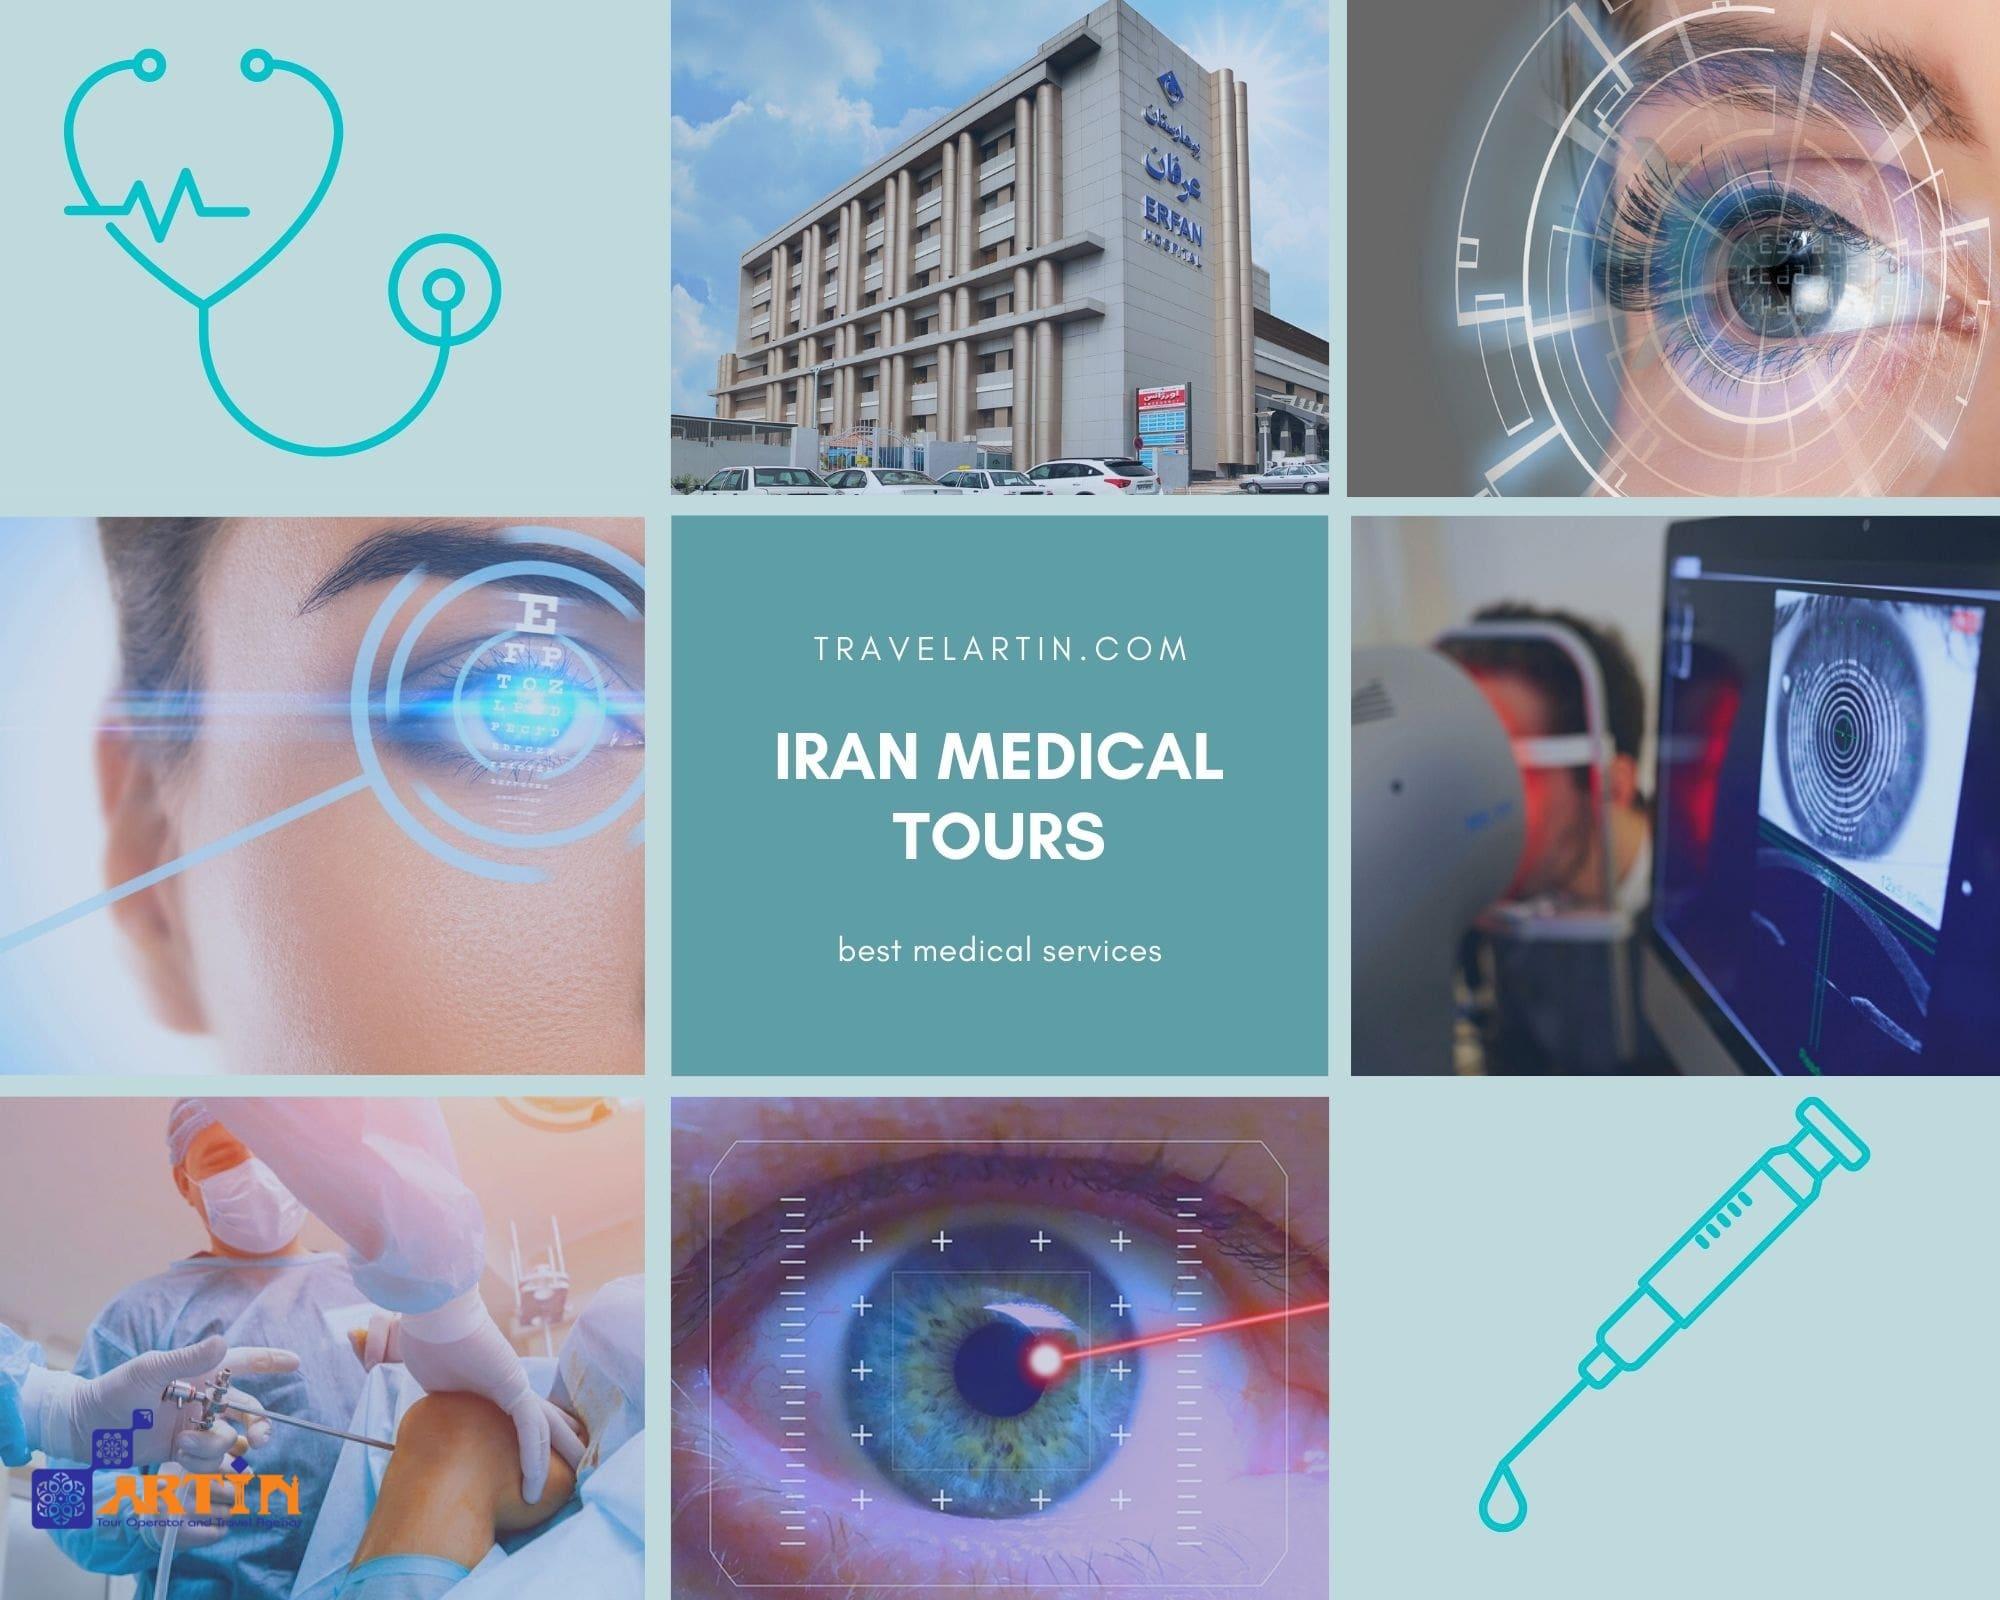 Best medical services in Iran tour Artin Travel